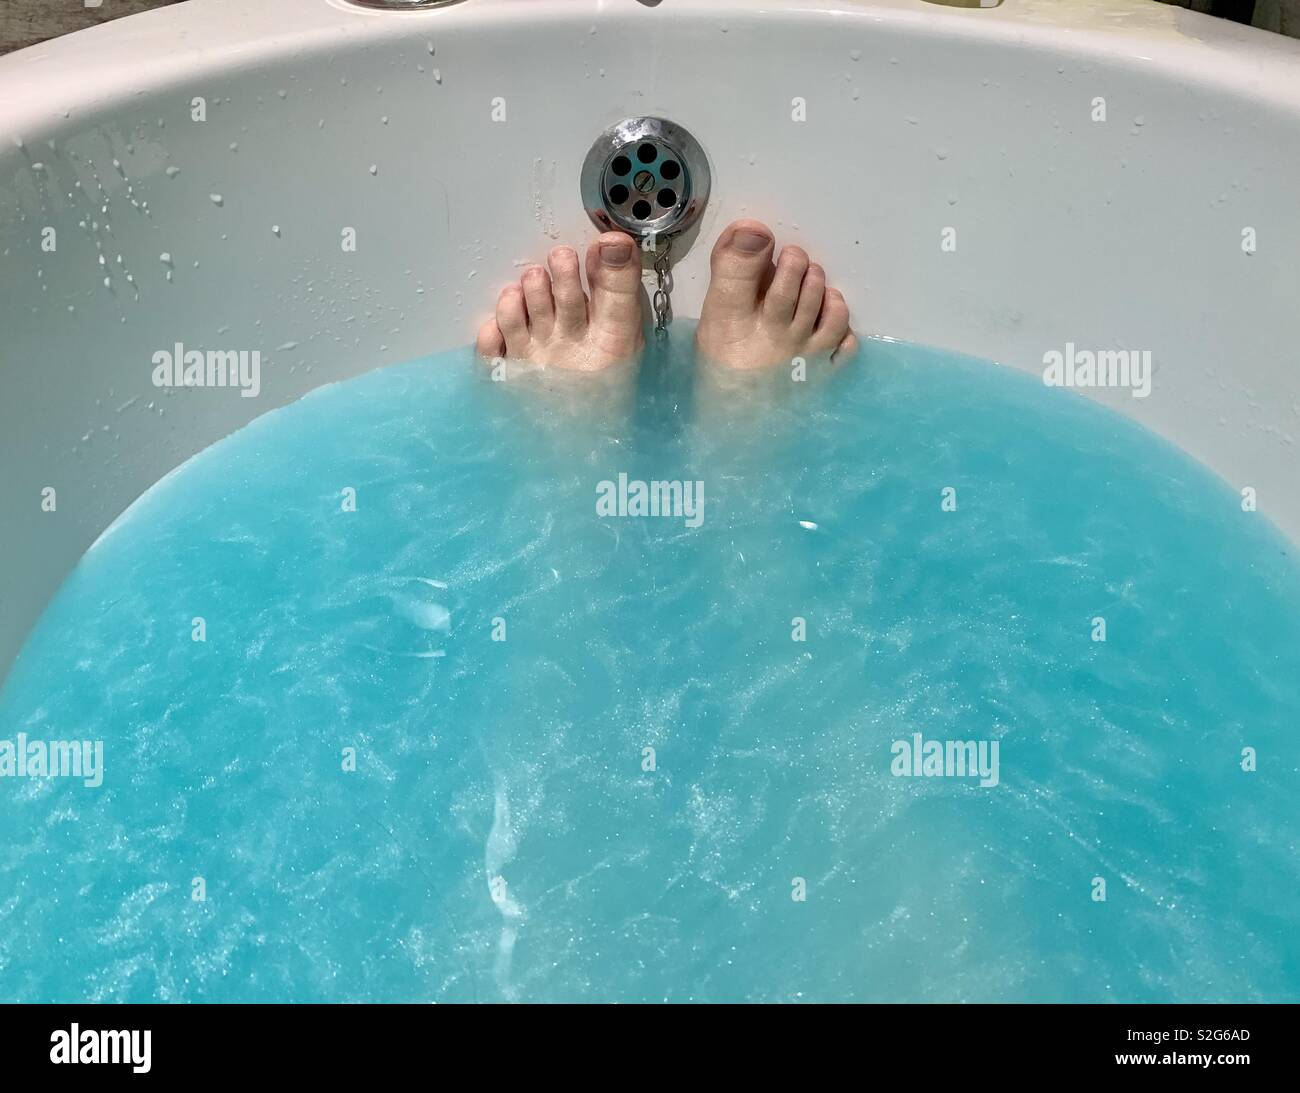 Blue bath - Stock Image